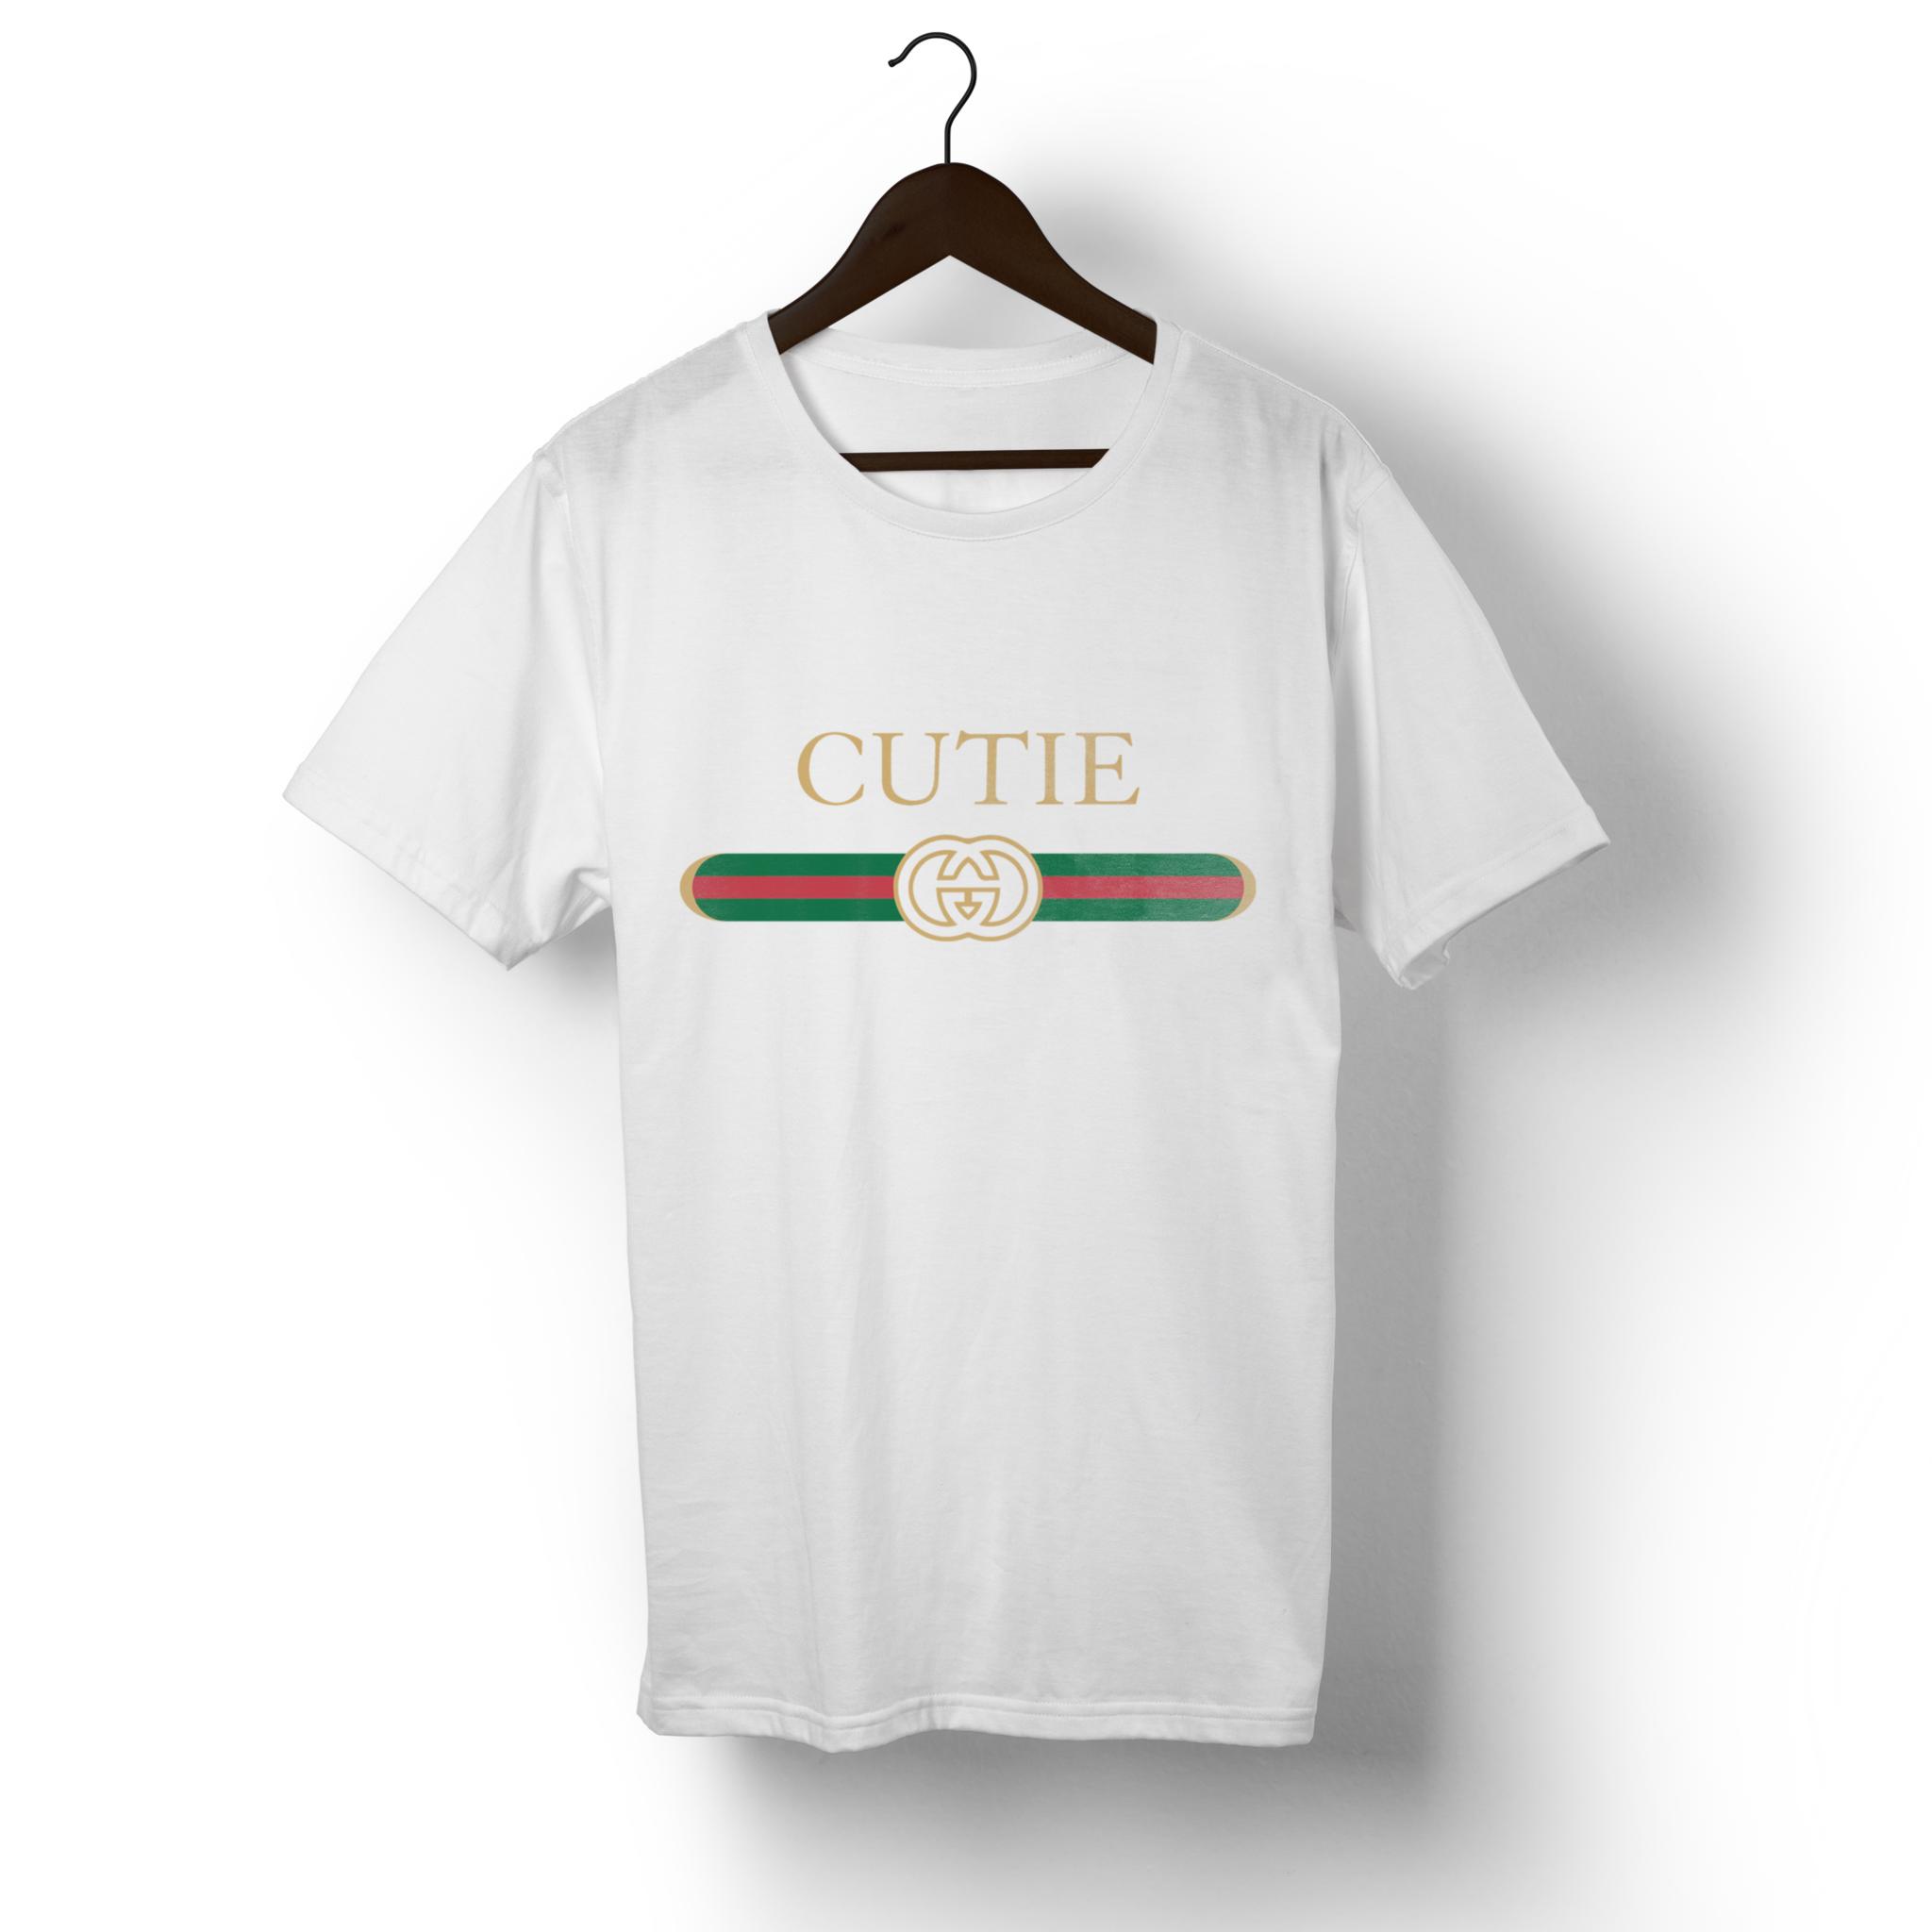 949c2e86 Cutie-Gucci Parody T-Shirt – SavageFlamingo   FW '17 LOOK   T shirt ...